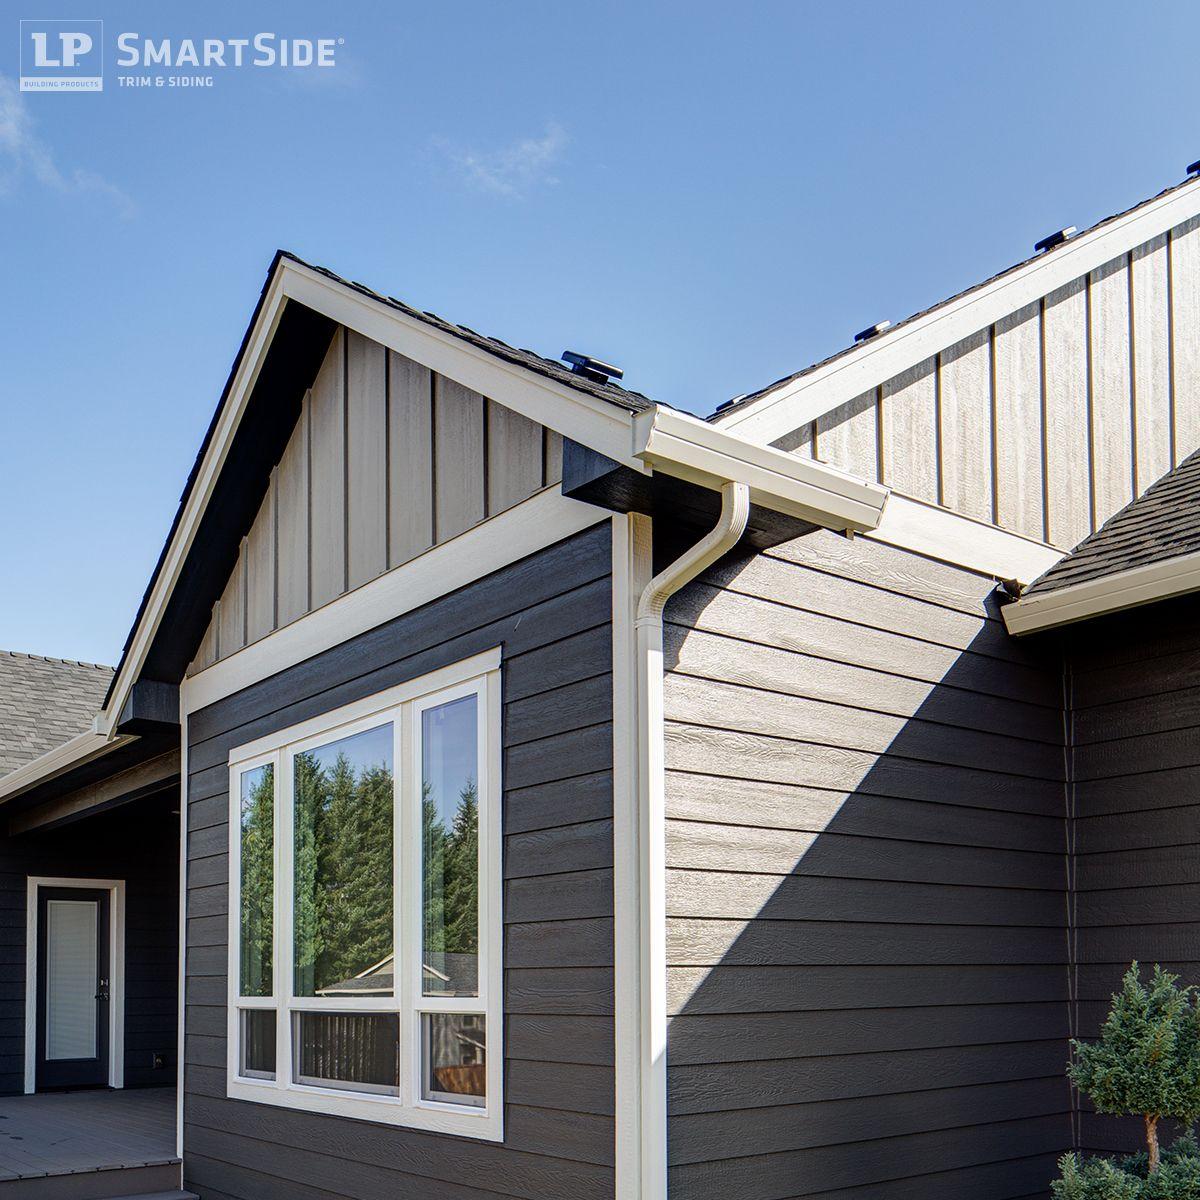 Lp Smartside Siding Extreme Impact Testing Exterior Siding Exterior Siding Options Stone Siding Exterior